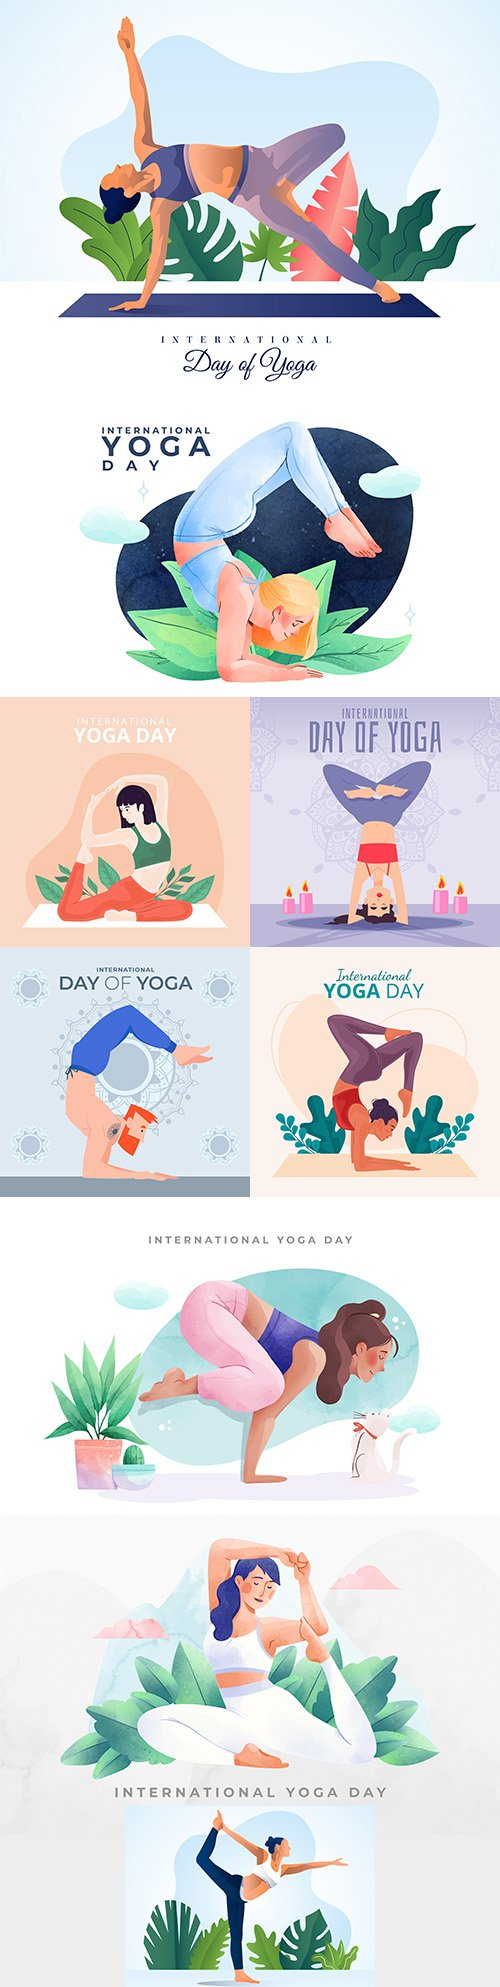 Yoga International day and meditation design illustration 3